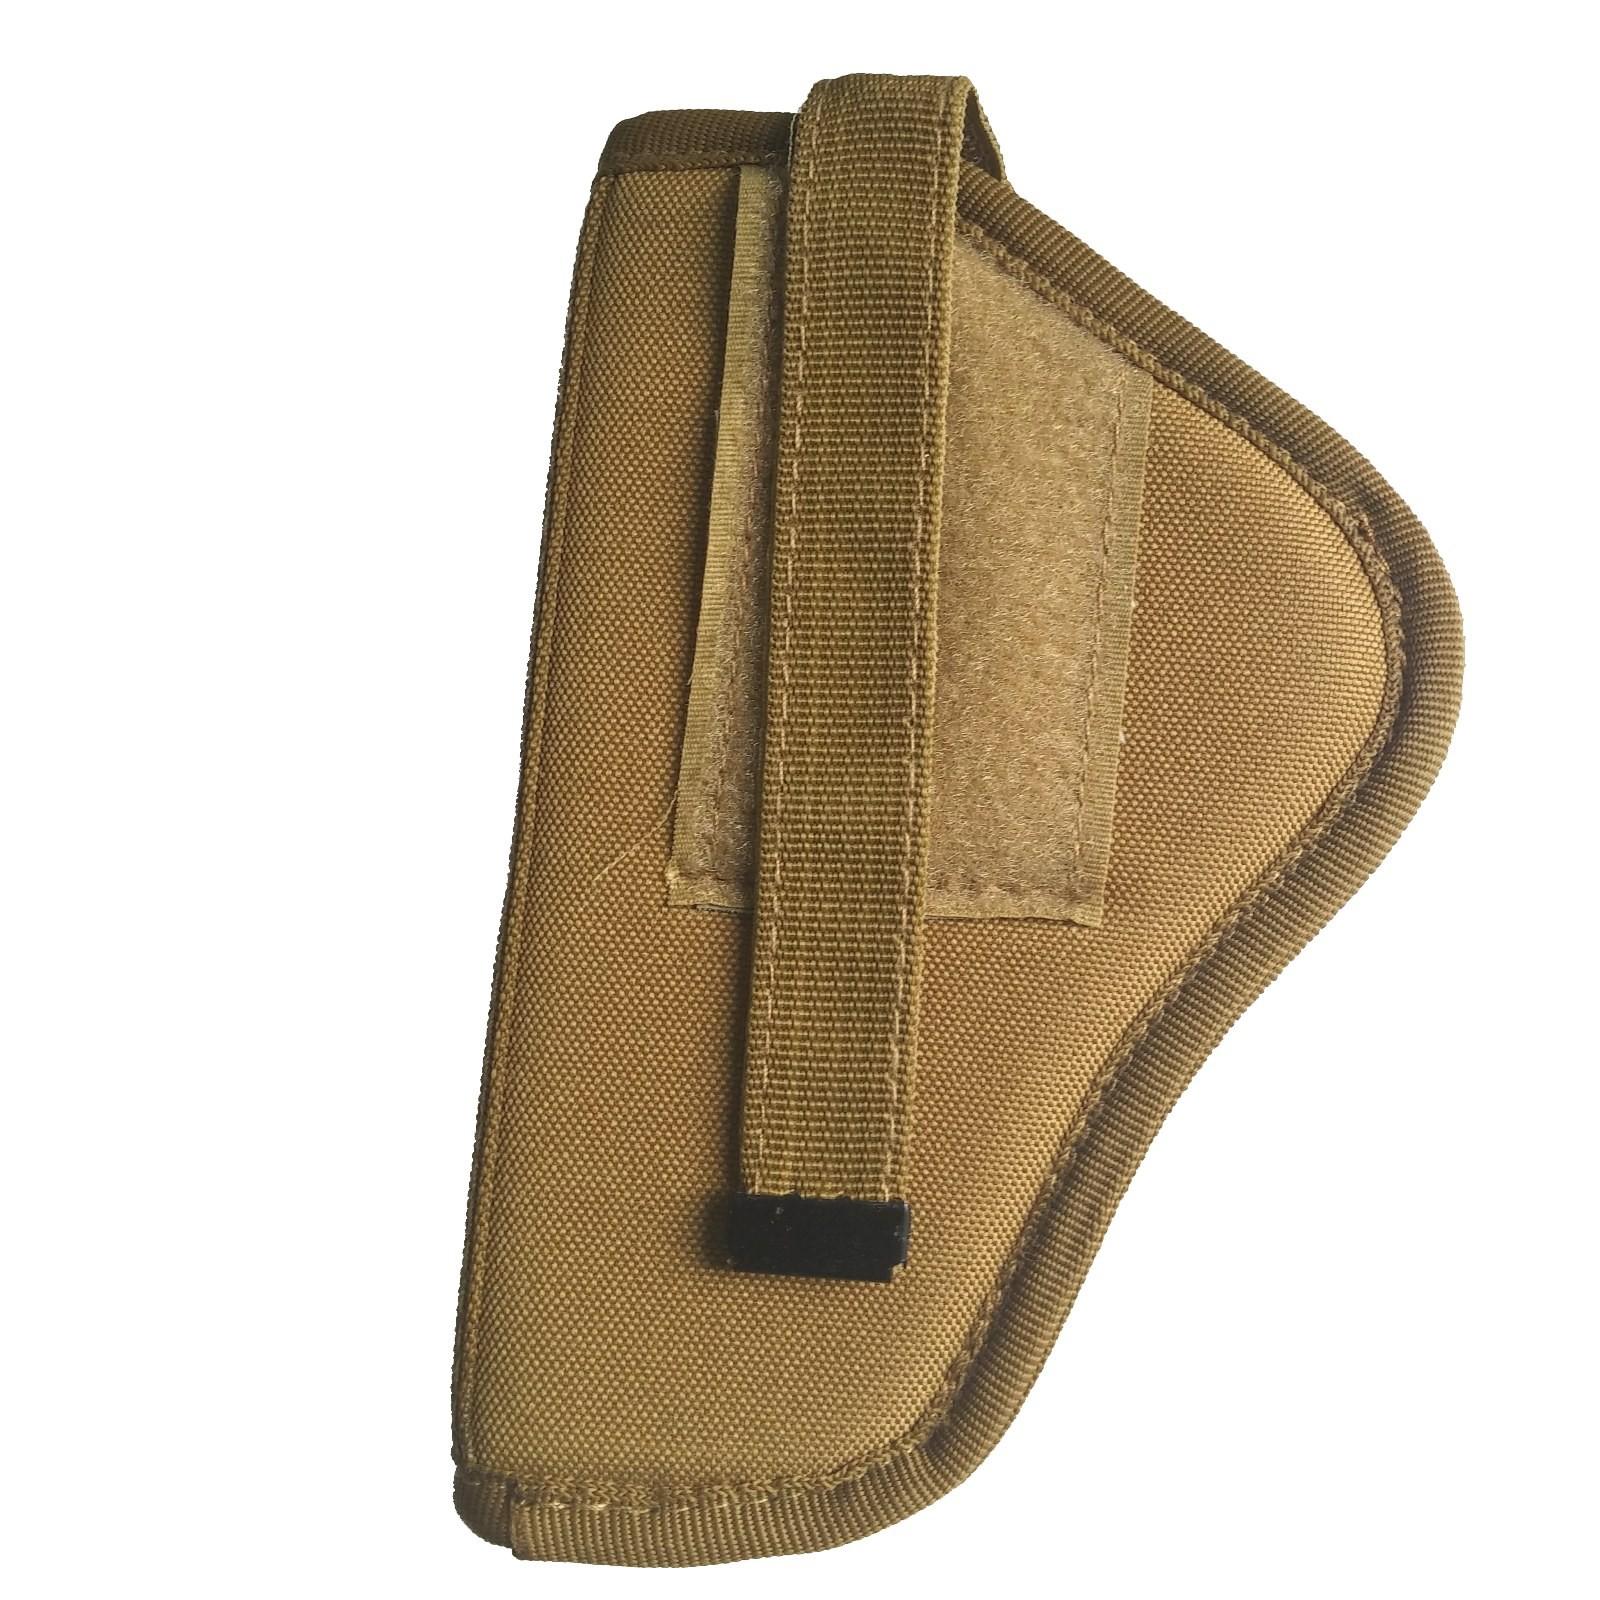 Fondina in cordura per Cintura TAN Militare per Softair Universale